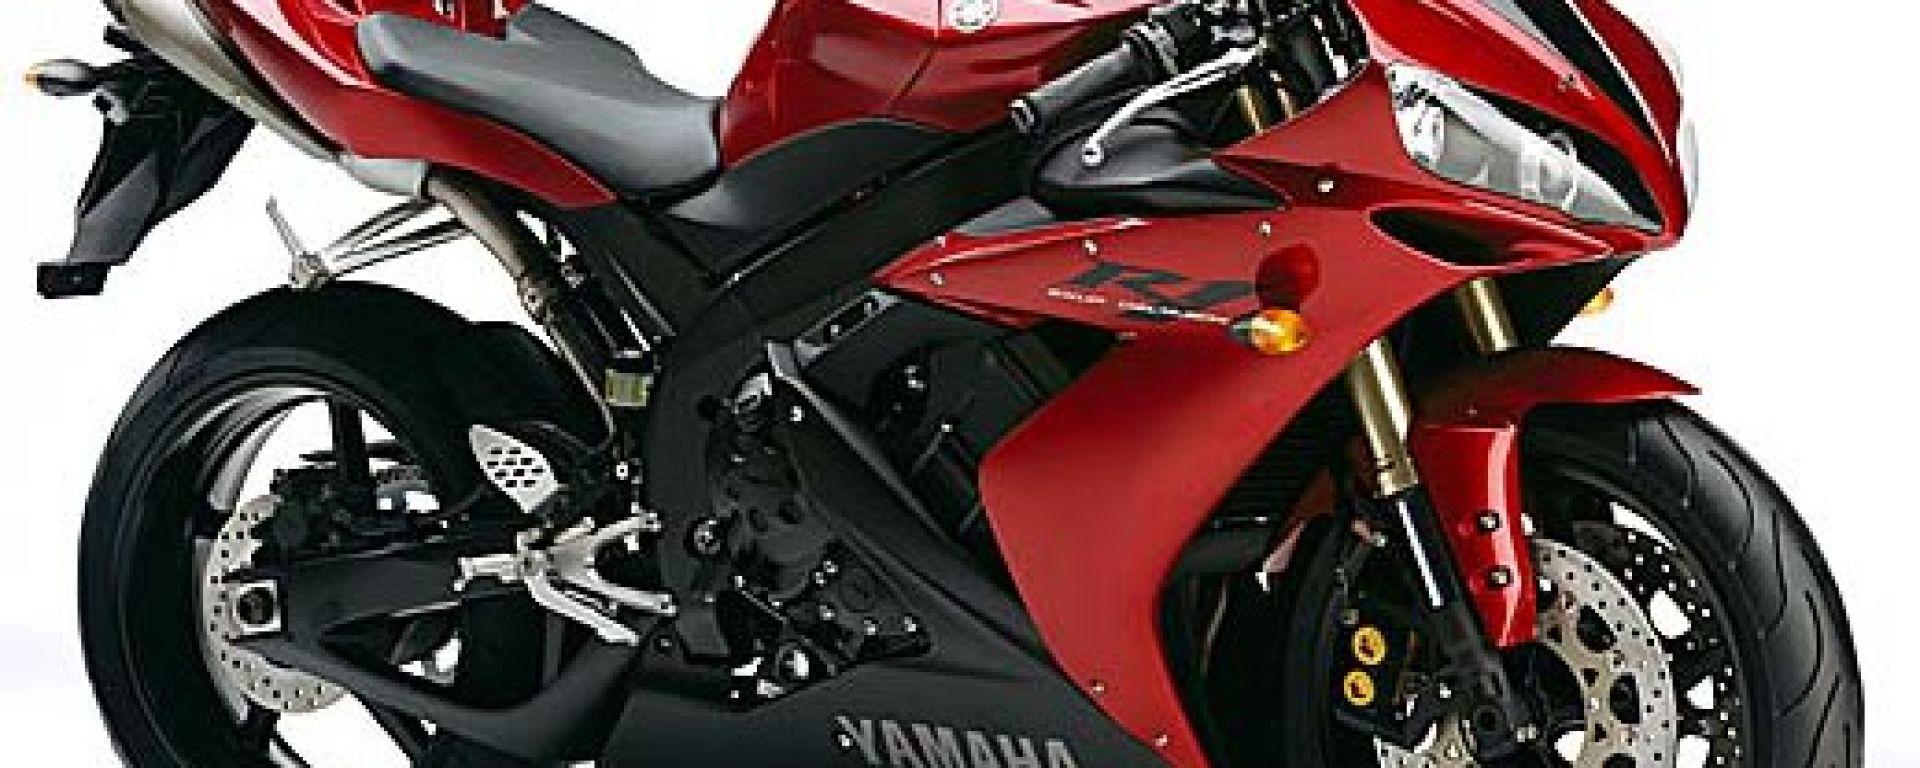 Novità Yamaha 2004